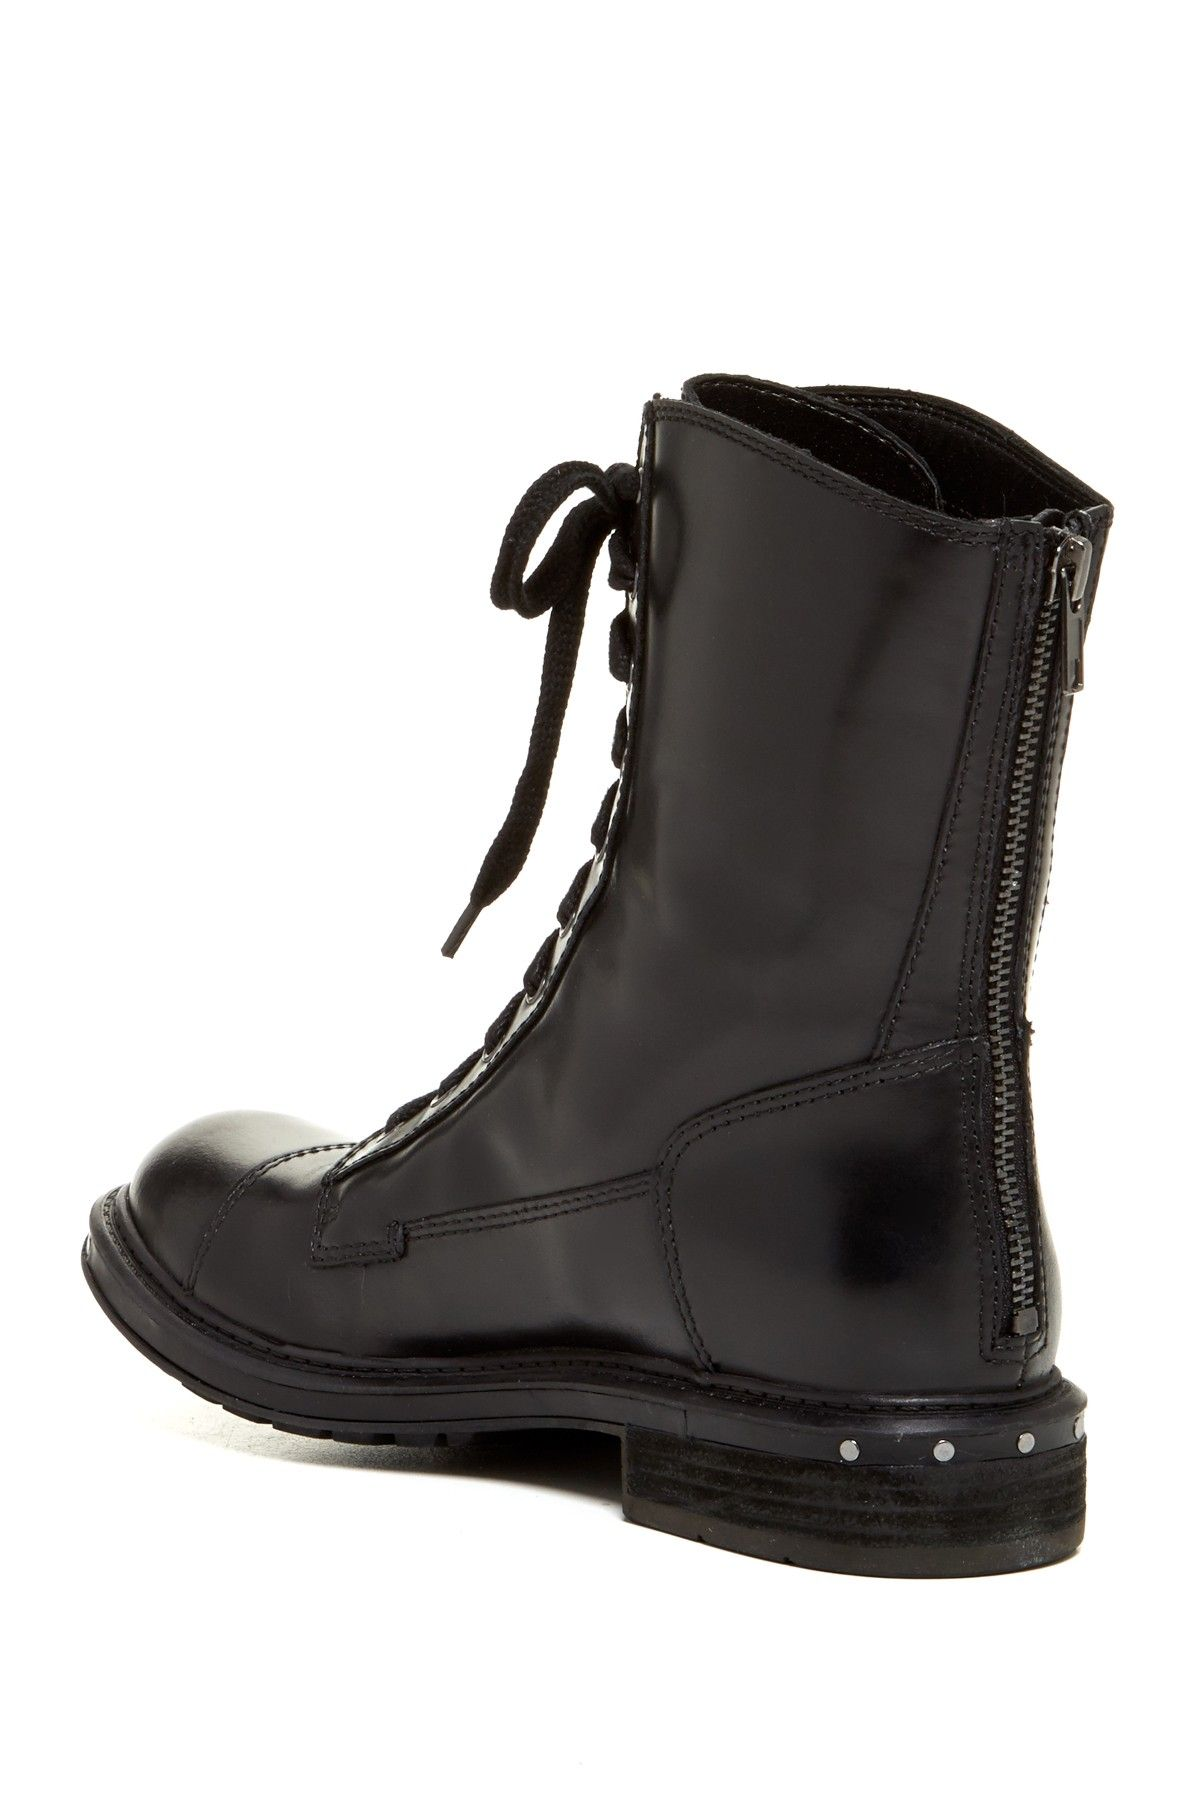 Renata Lace-Up Boot by Naya on @HauteLook